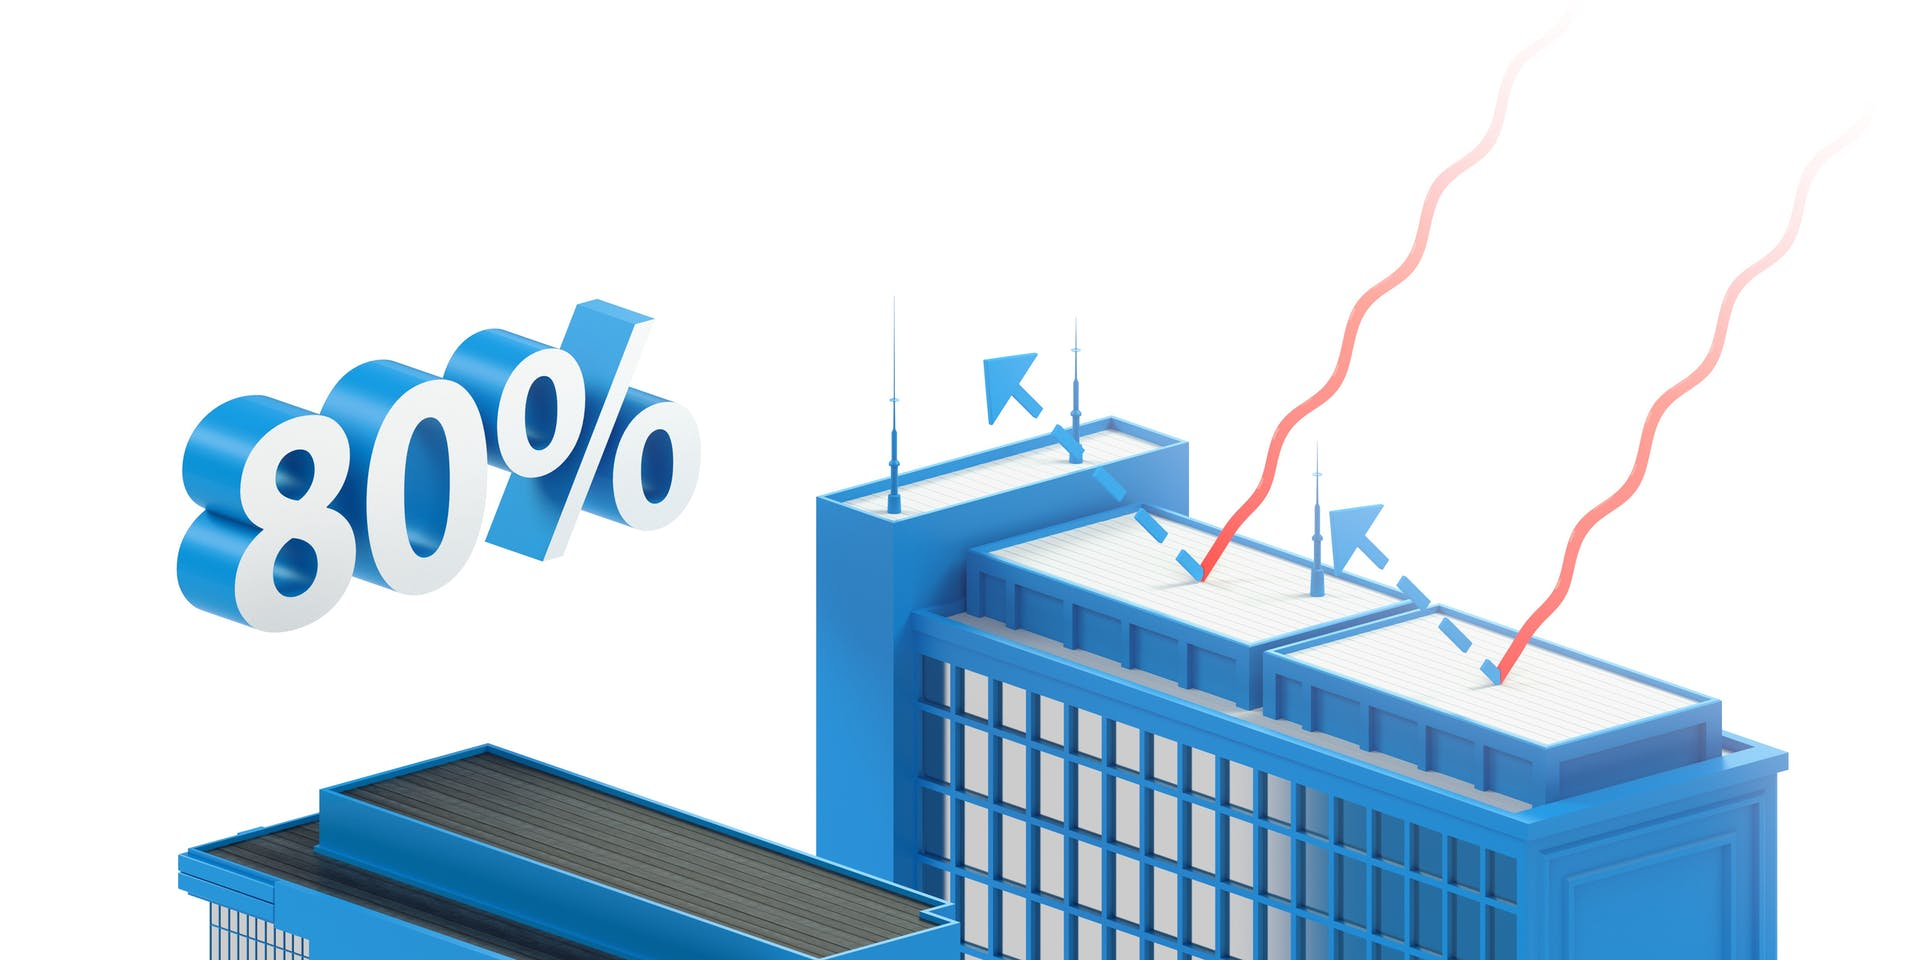 ClimateCooler | Energy-Efficient Roof Treatment Explained Emission Diagram | Tikkurila